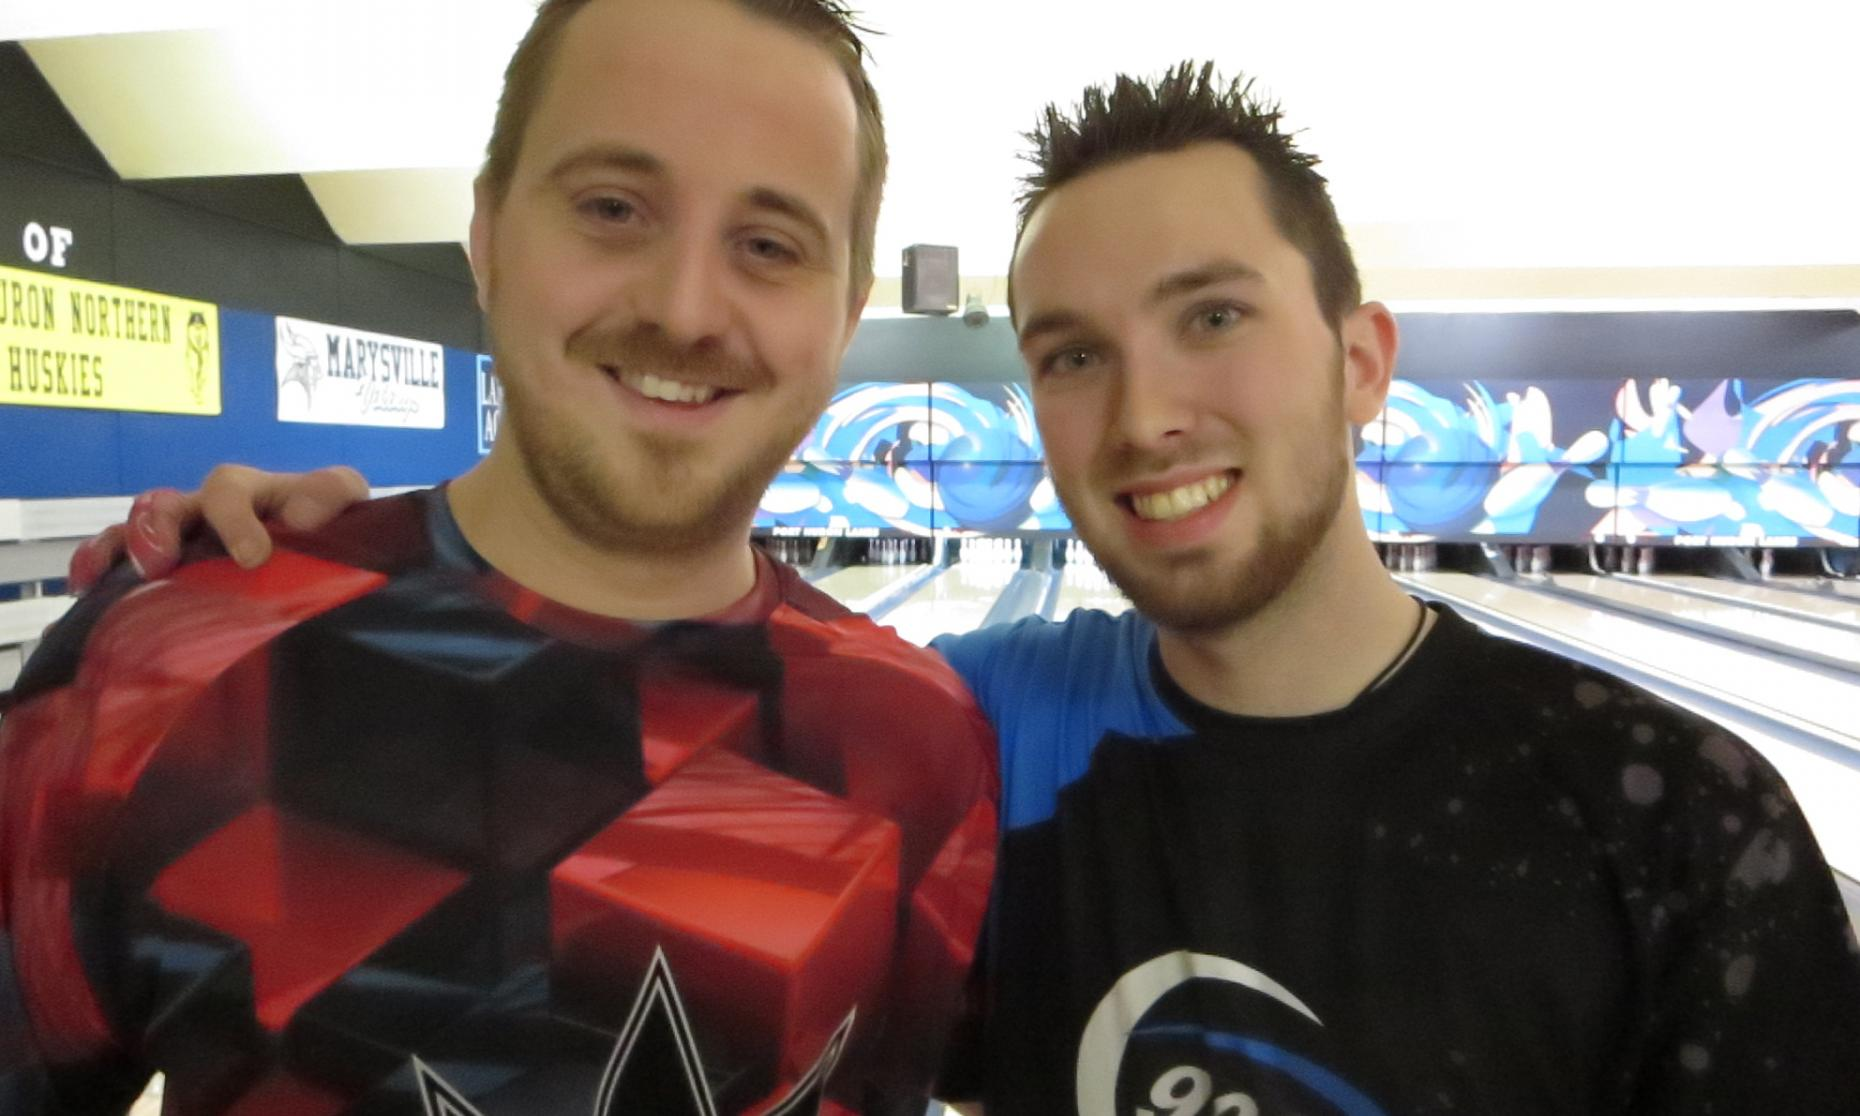 Runner up Matt Langolf (left) and Champion Kyle King (right)